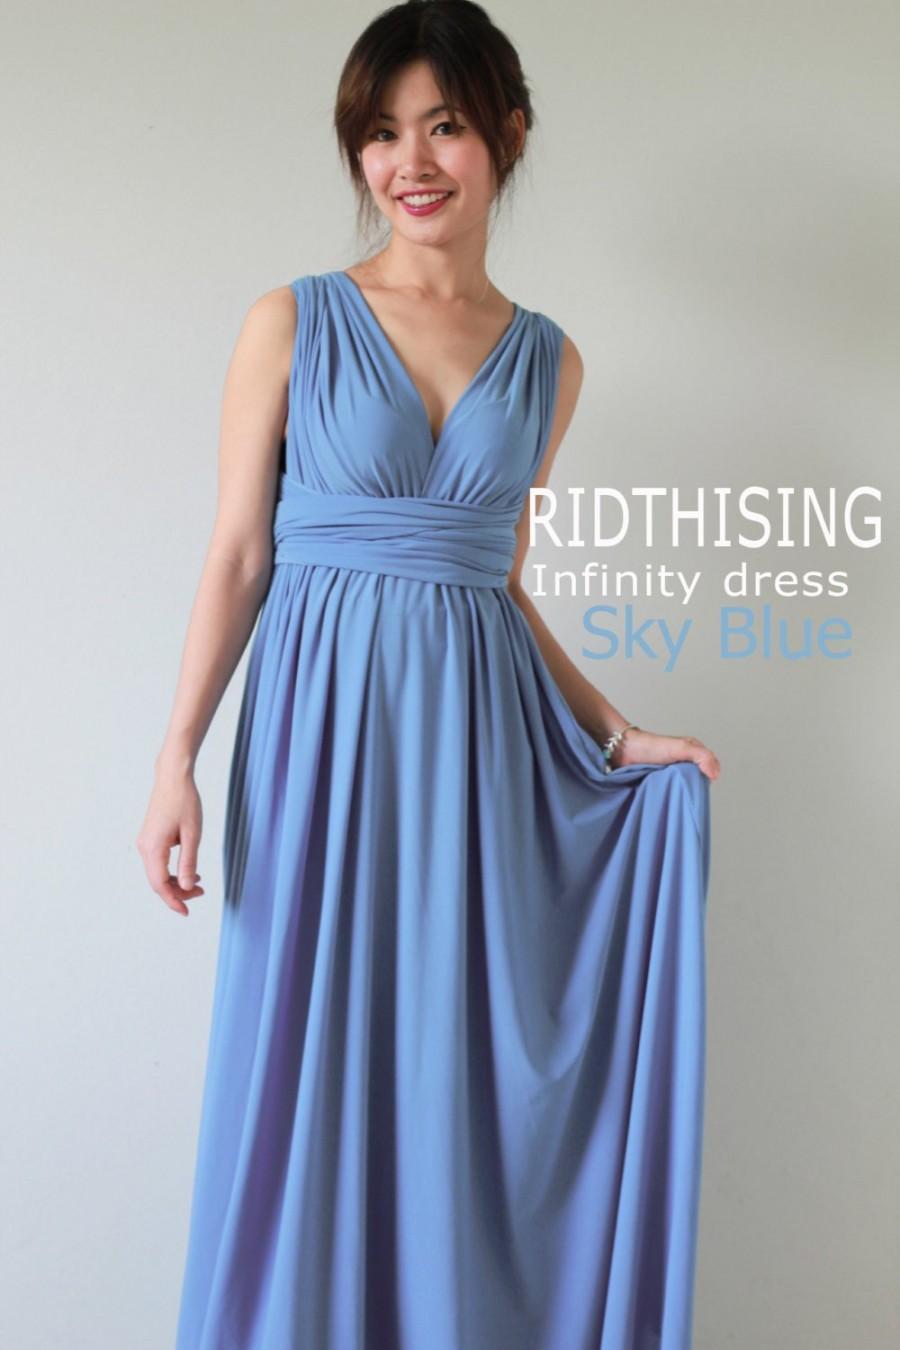 Mariage - Maxi Sky Blue Infinity Dress Bridesmaid Dress Prom Dress Convertible Dress Wrap Dress